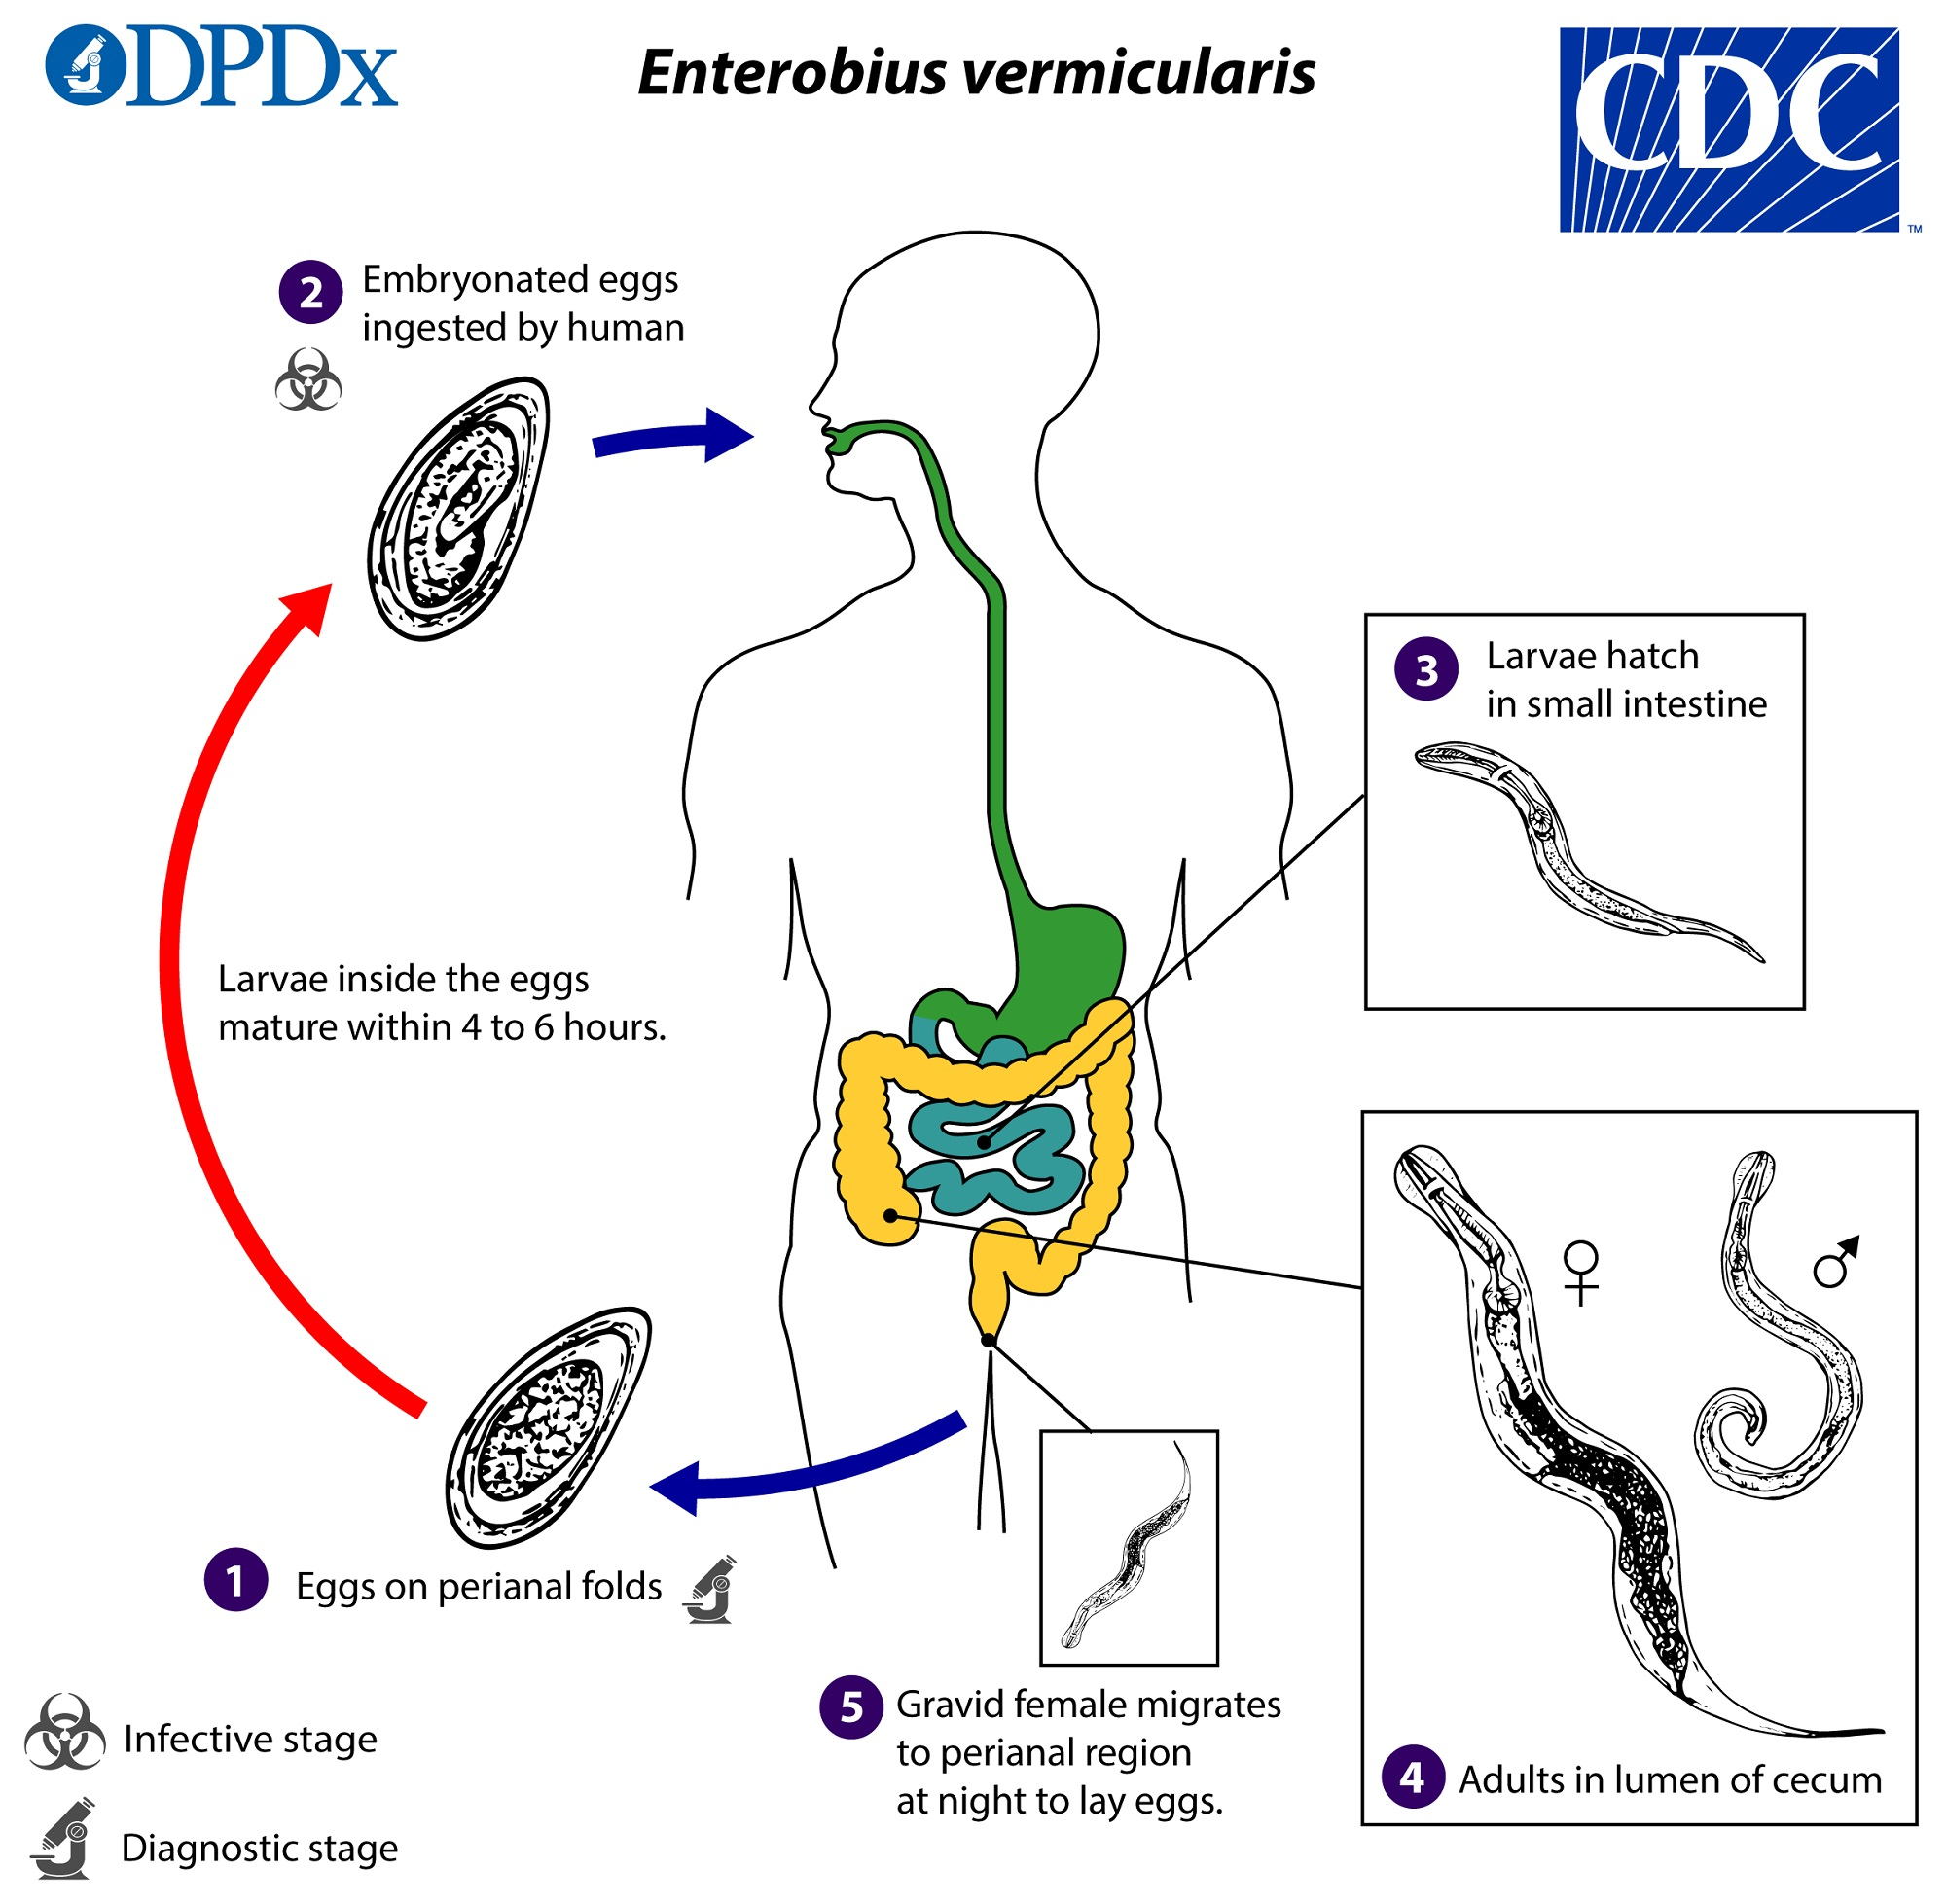 enterobius vermicularis kiejtése